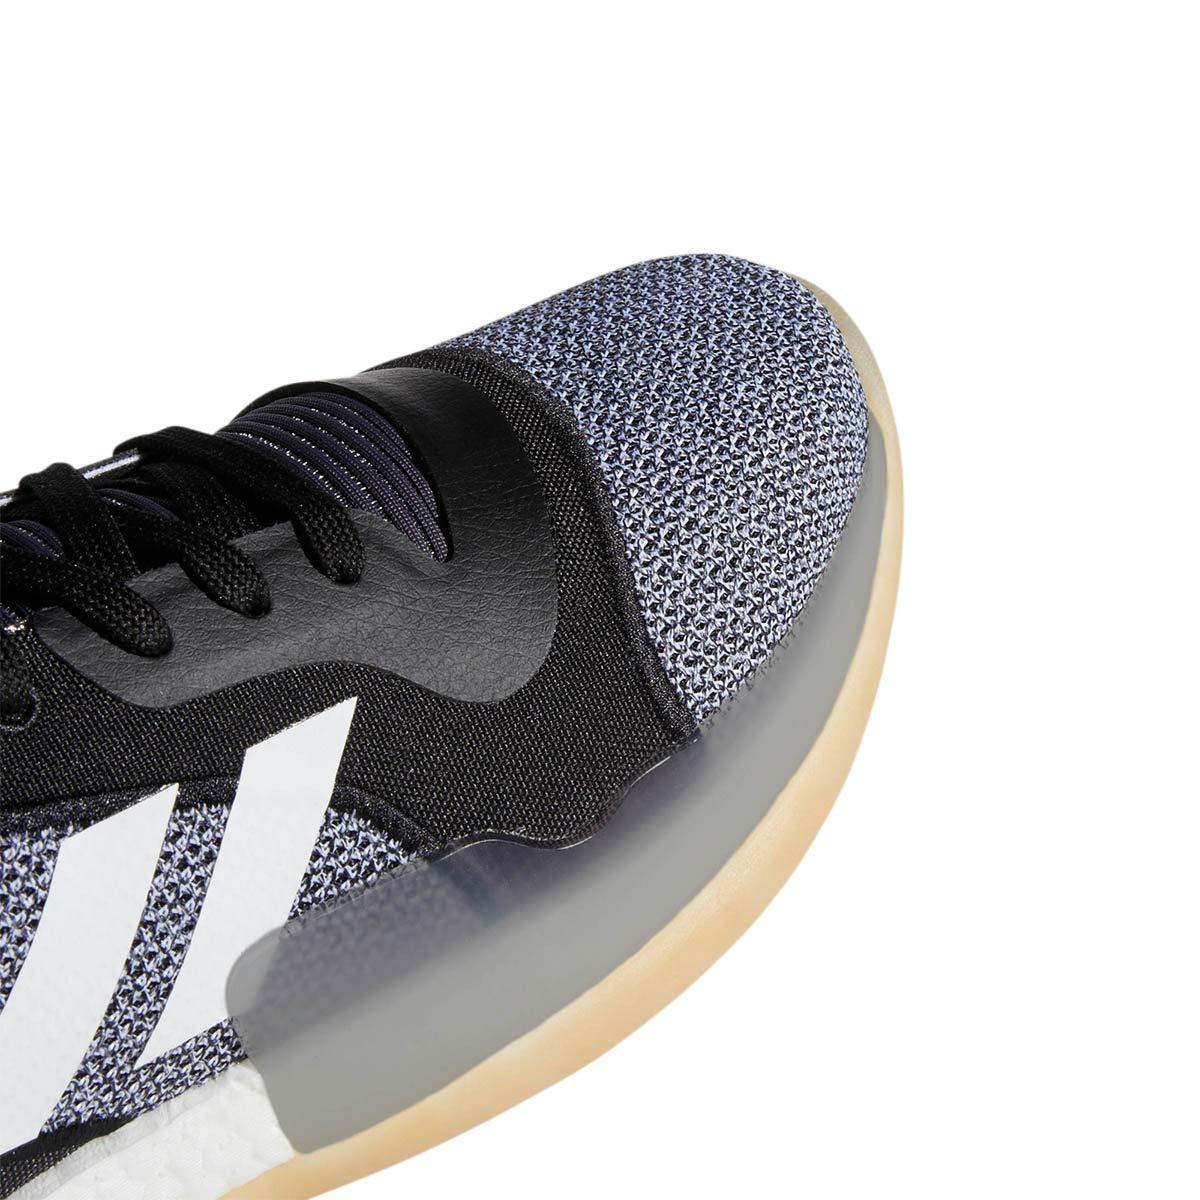 Adidas Adidas Adidas Marquee Boost Low 49 1 3-UK 13,5 B07NJ73KHY | New Products  6fb7a3